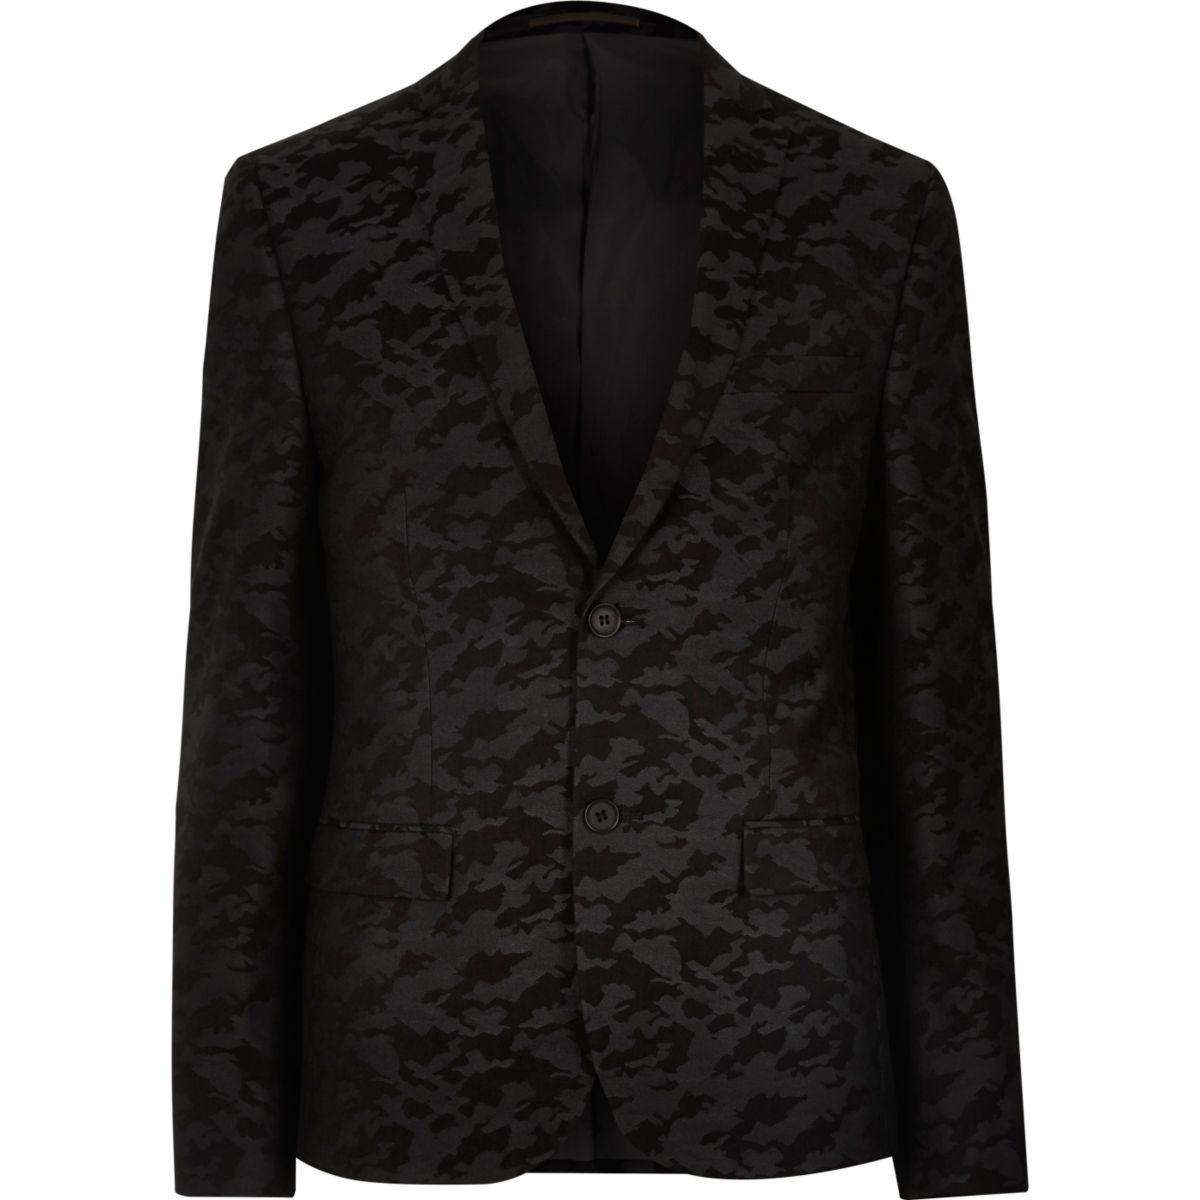 Black camo skinny suit jacket